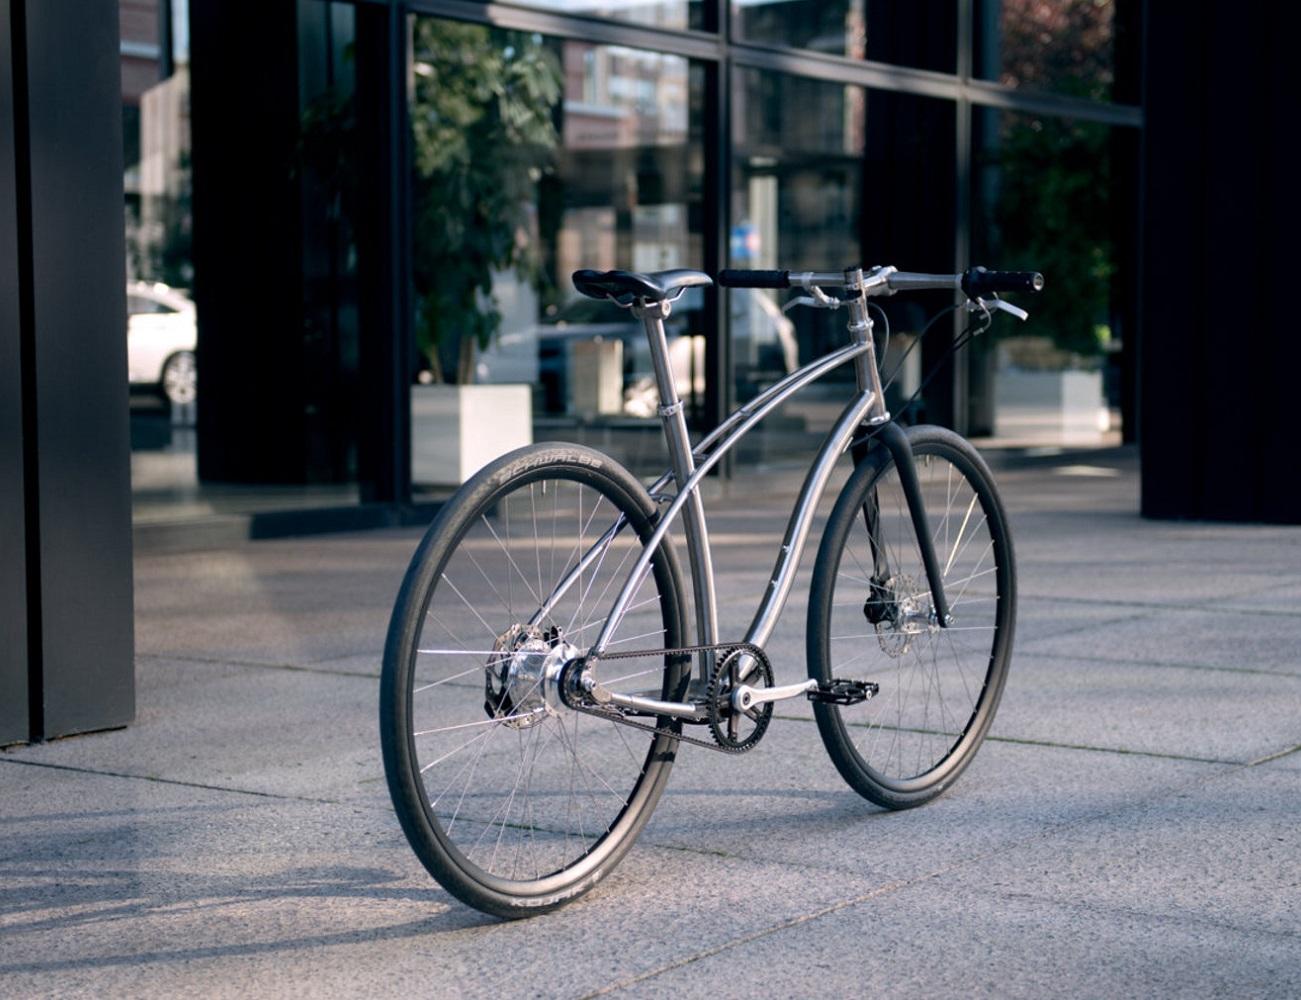 N0.1 Titanium Bike by Budnitz Bicycles